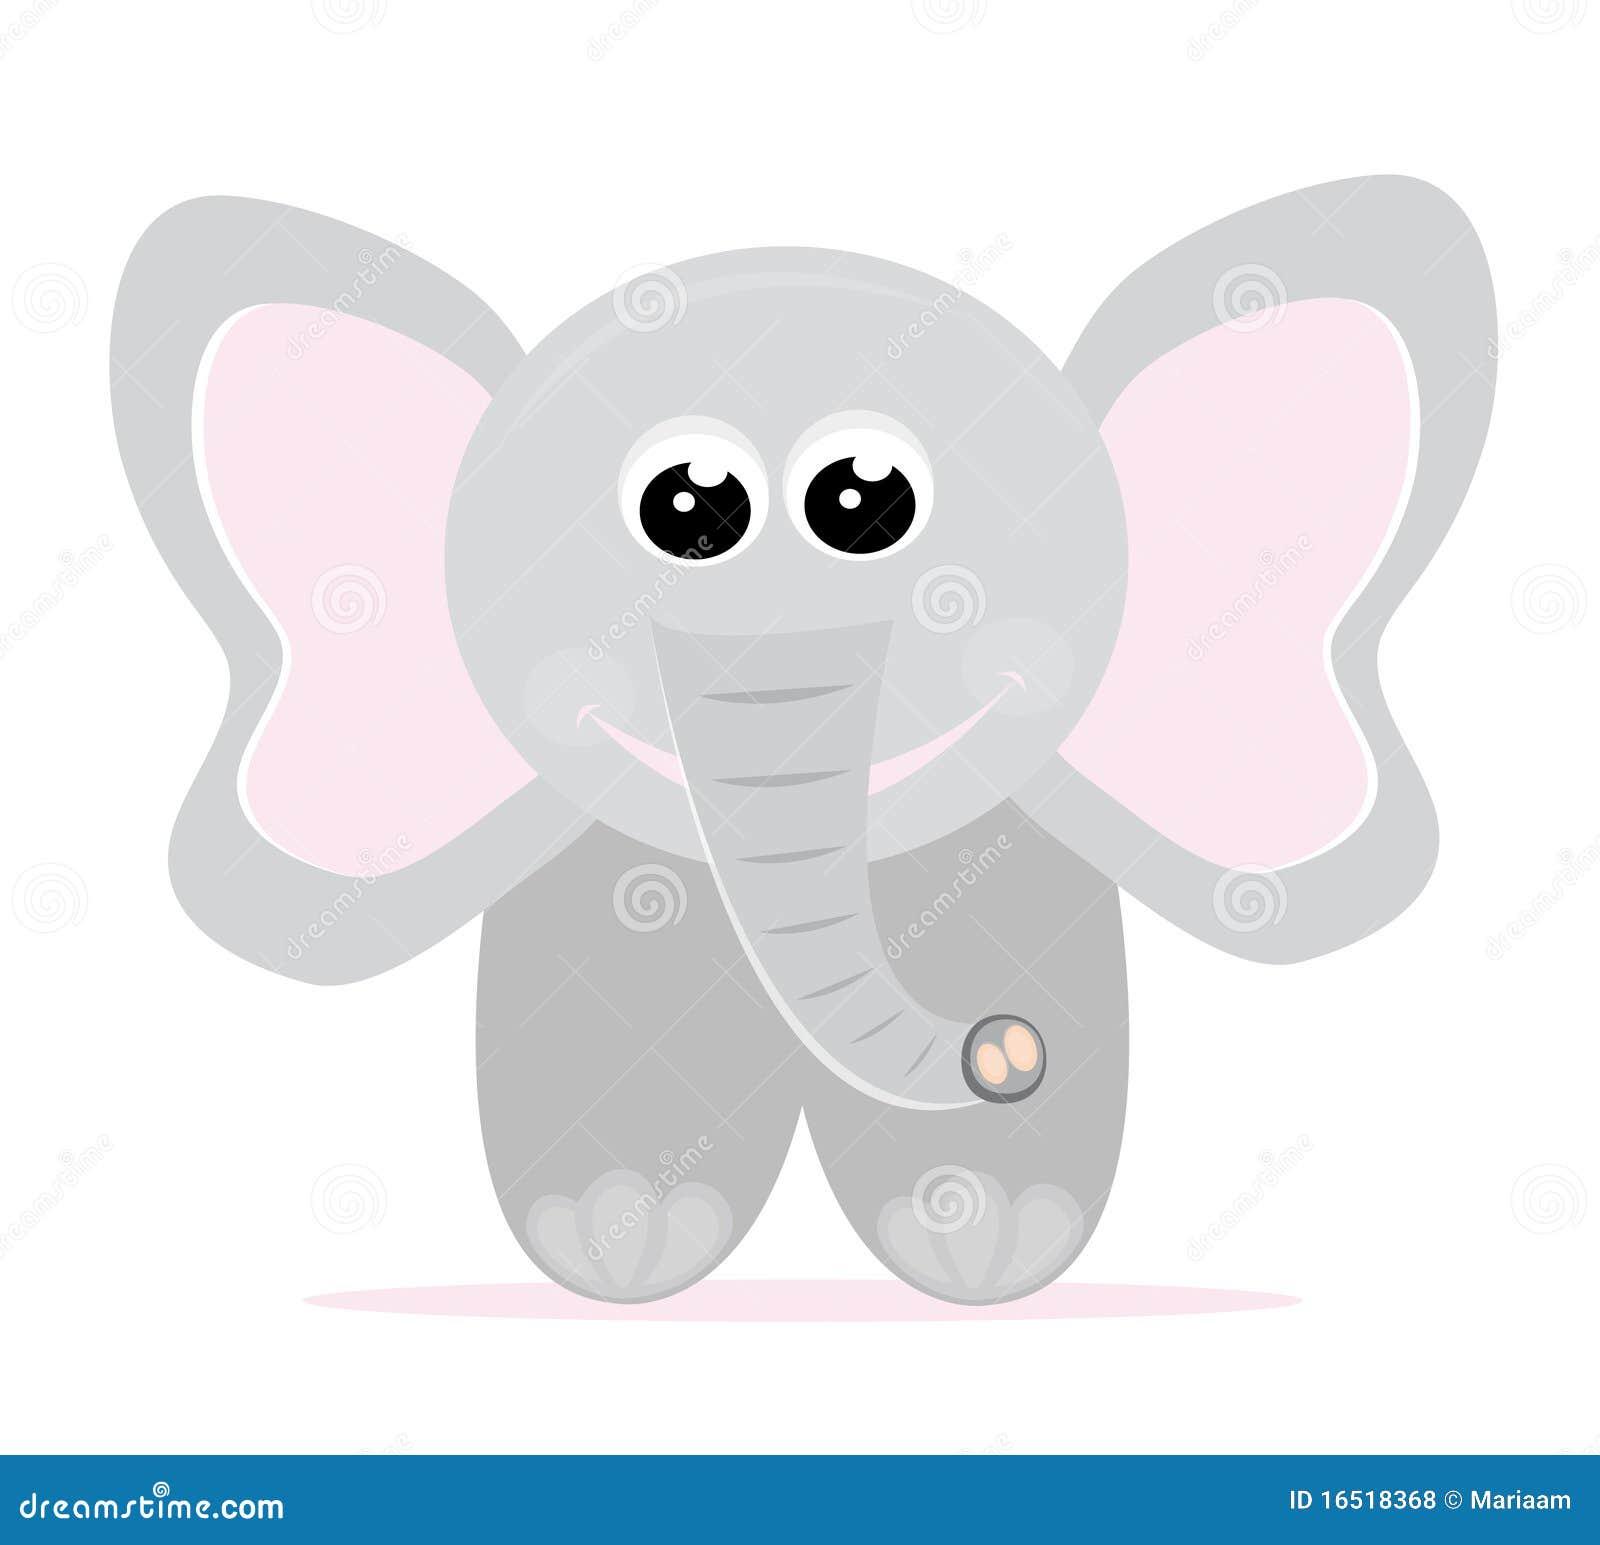 Baby Elephant Cartoon Stock Vector Illustration Of